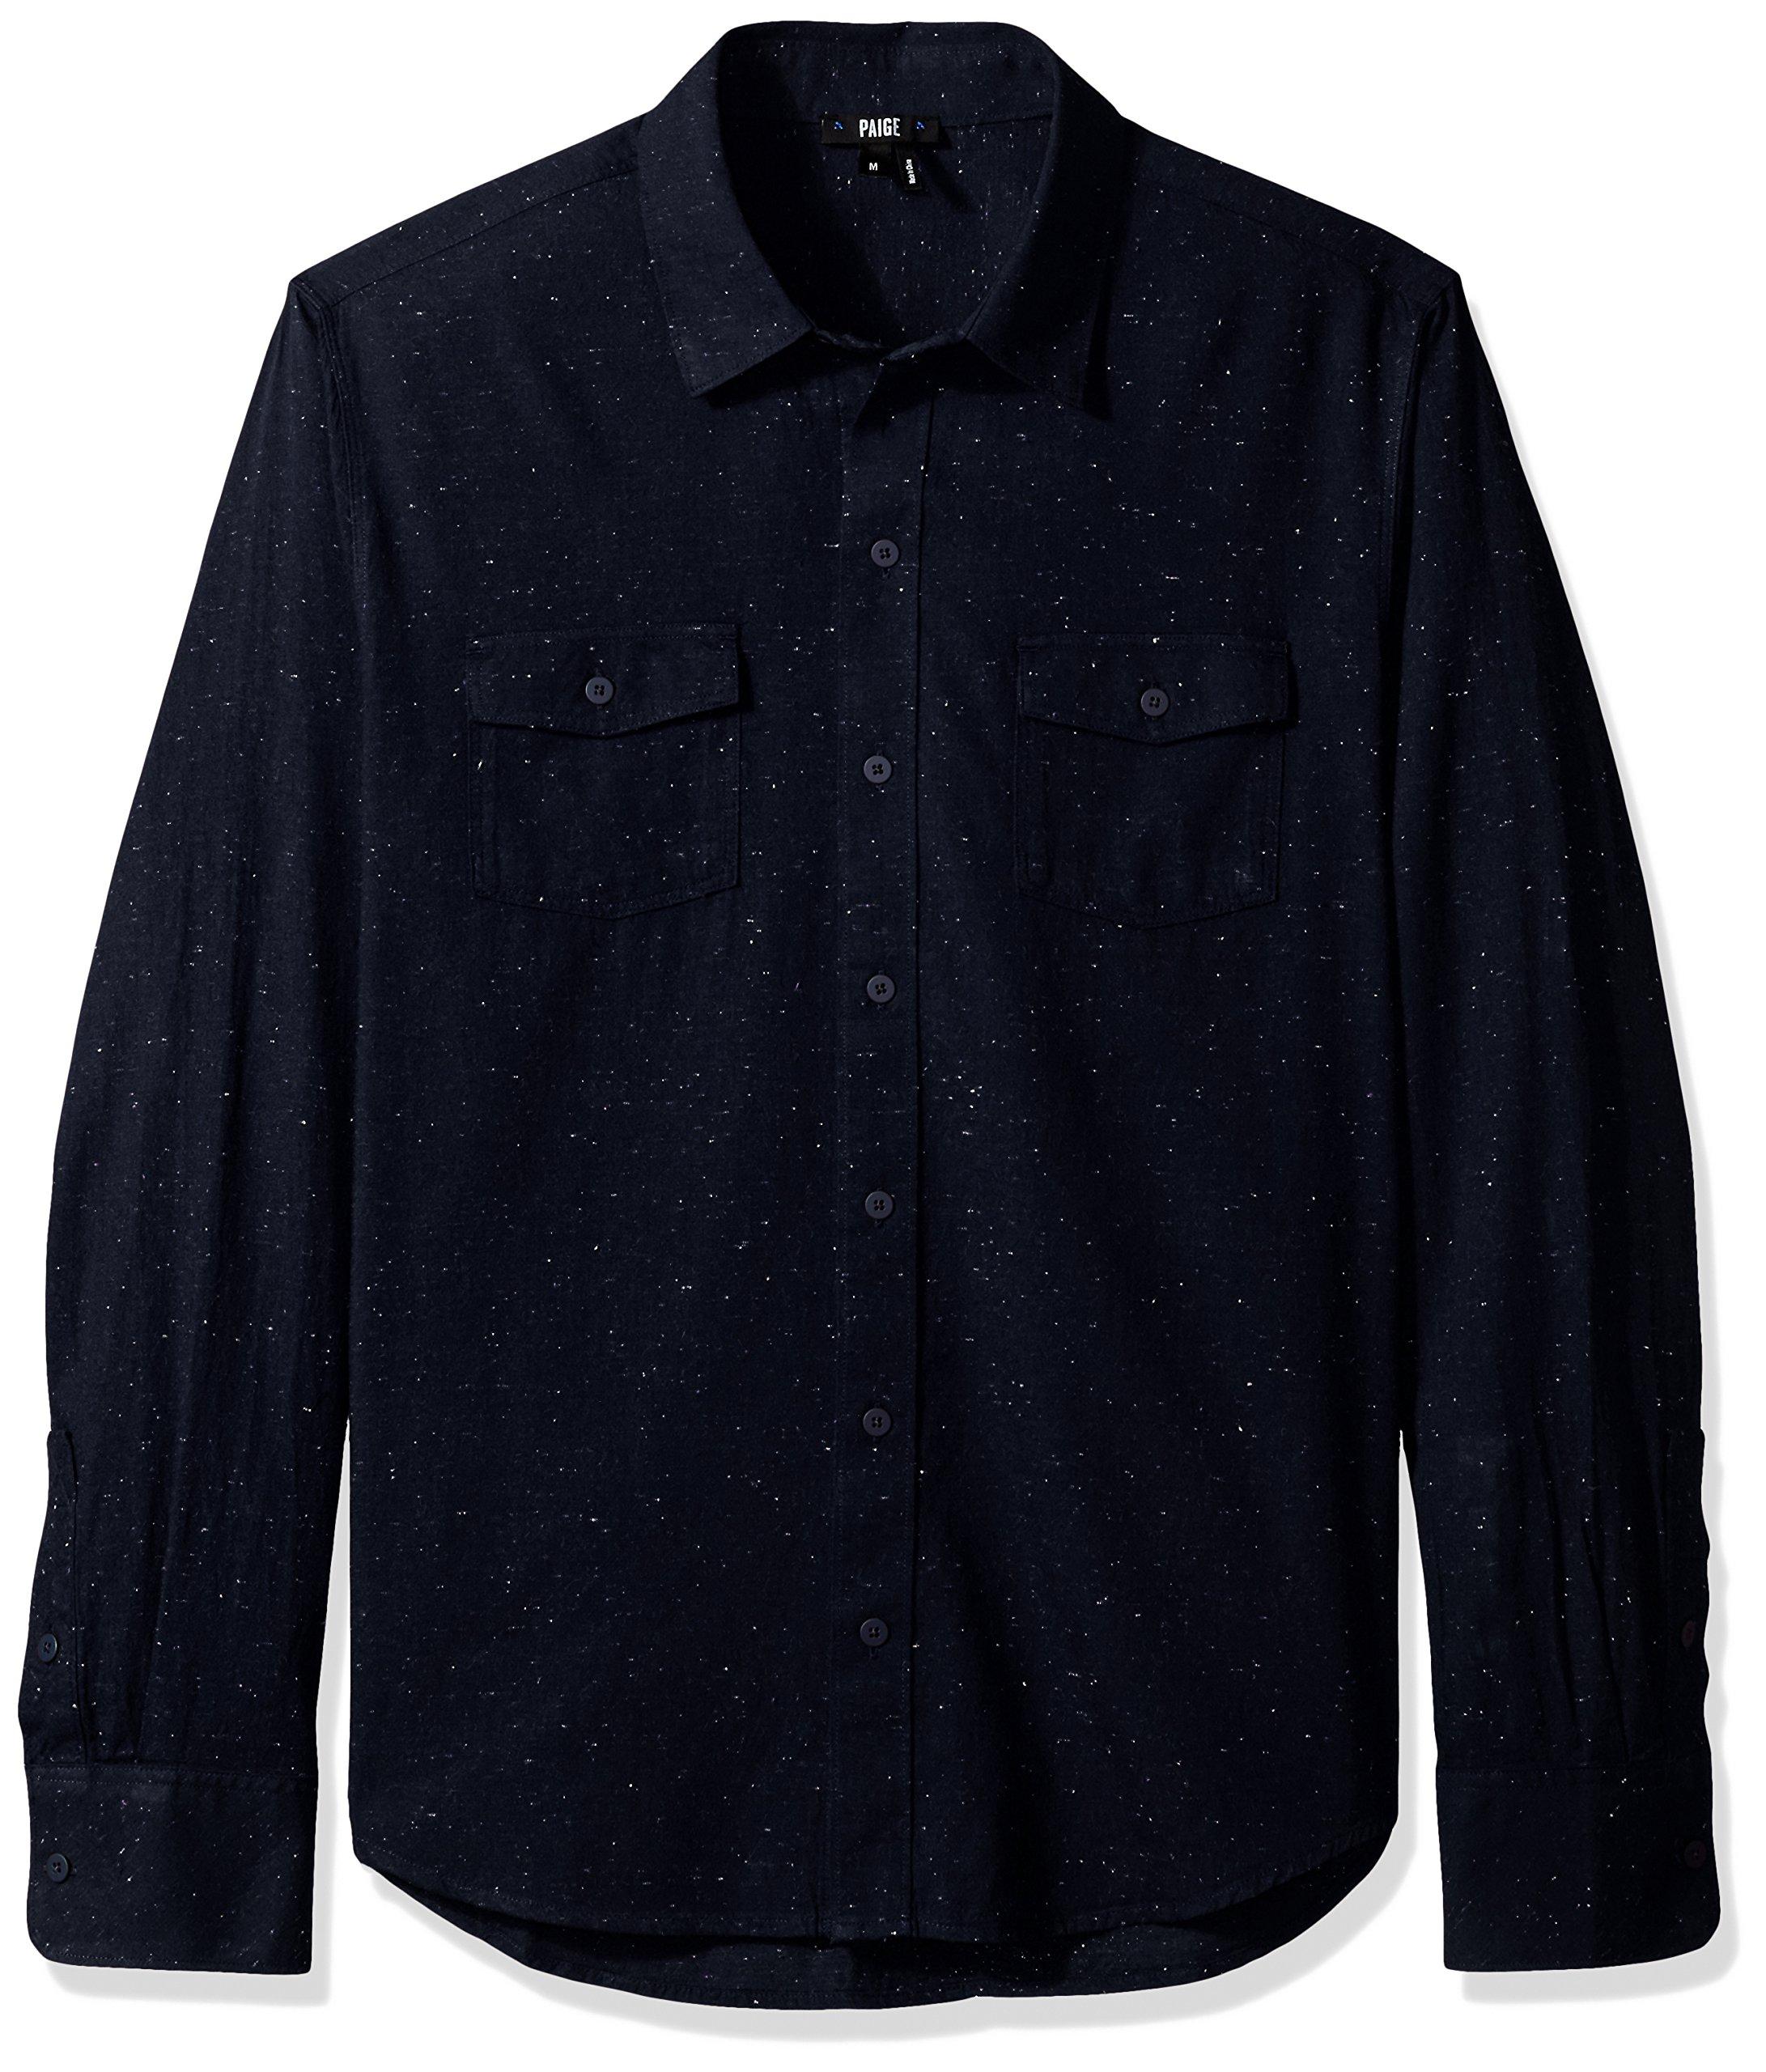 PAIGE Men's Everett Brushed Cotton Button Down Shirt, Blue Spruce Nep, S